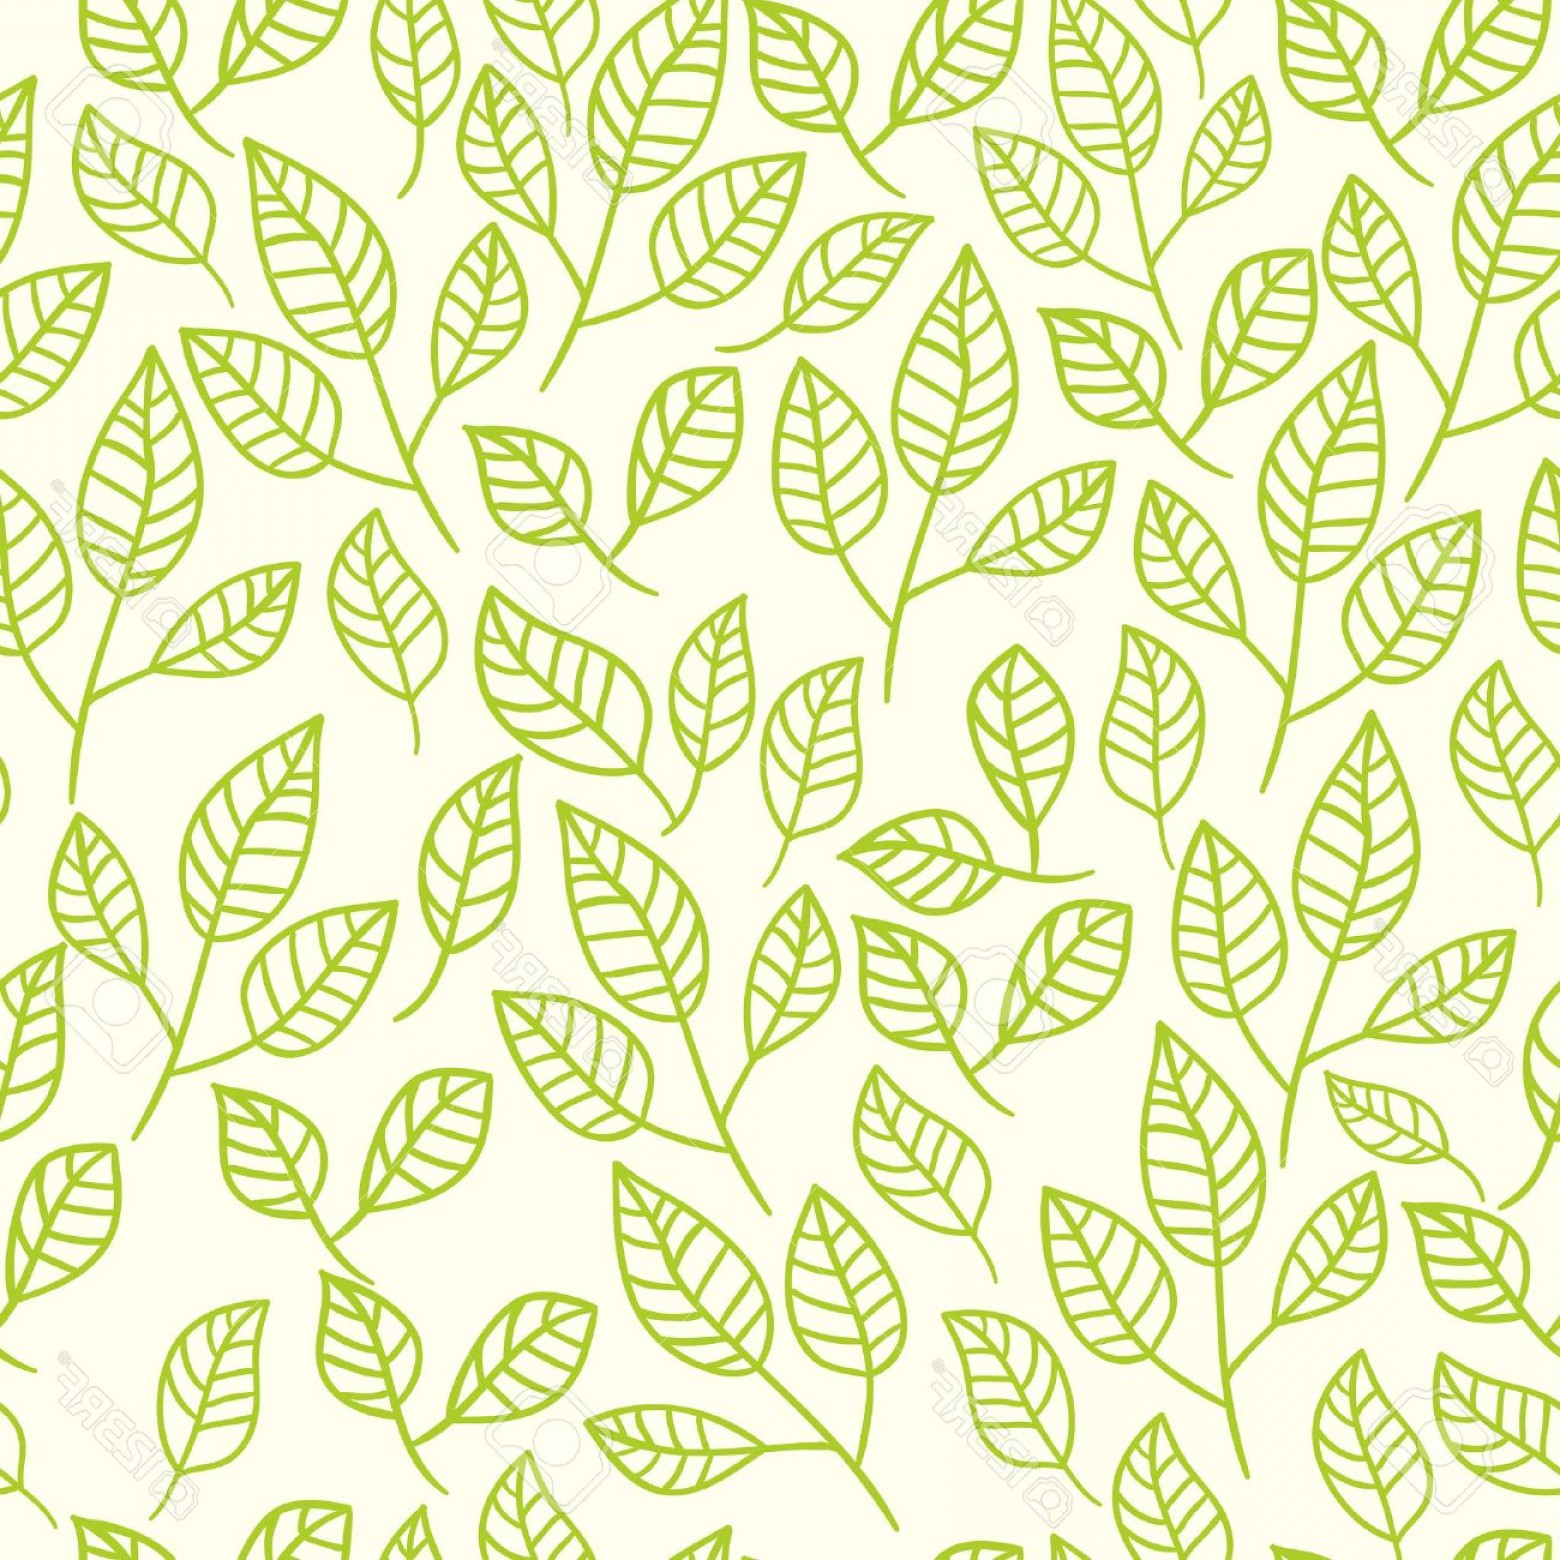 1560x1560 Cute Leaf Background Vector Geekchicpro